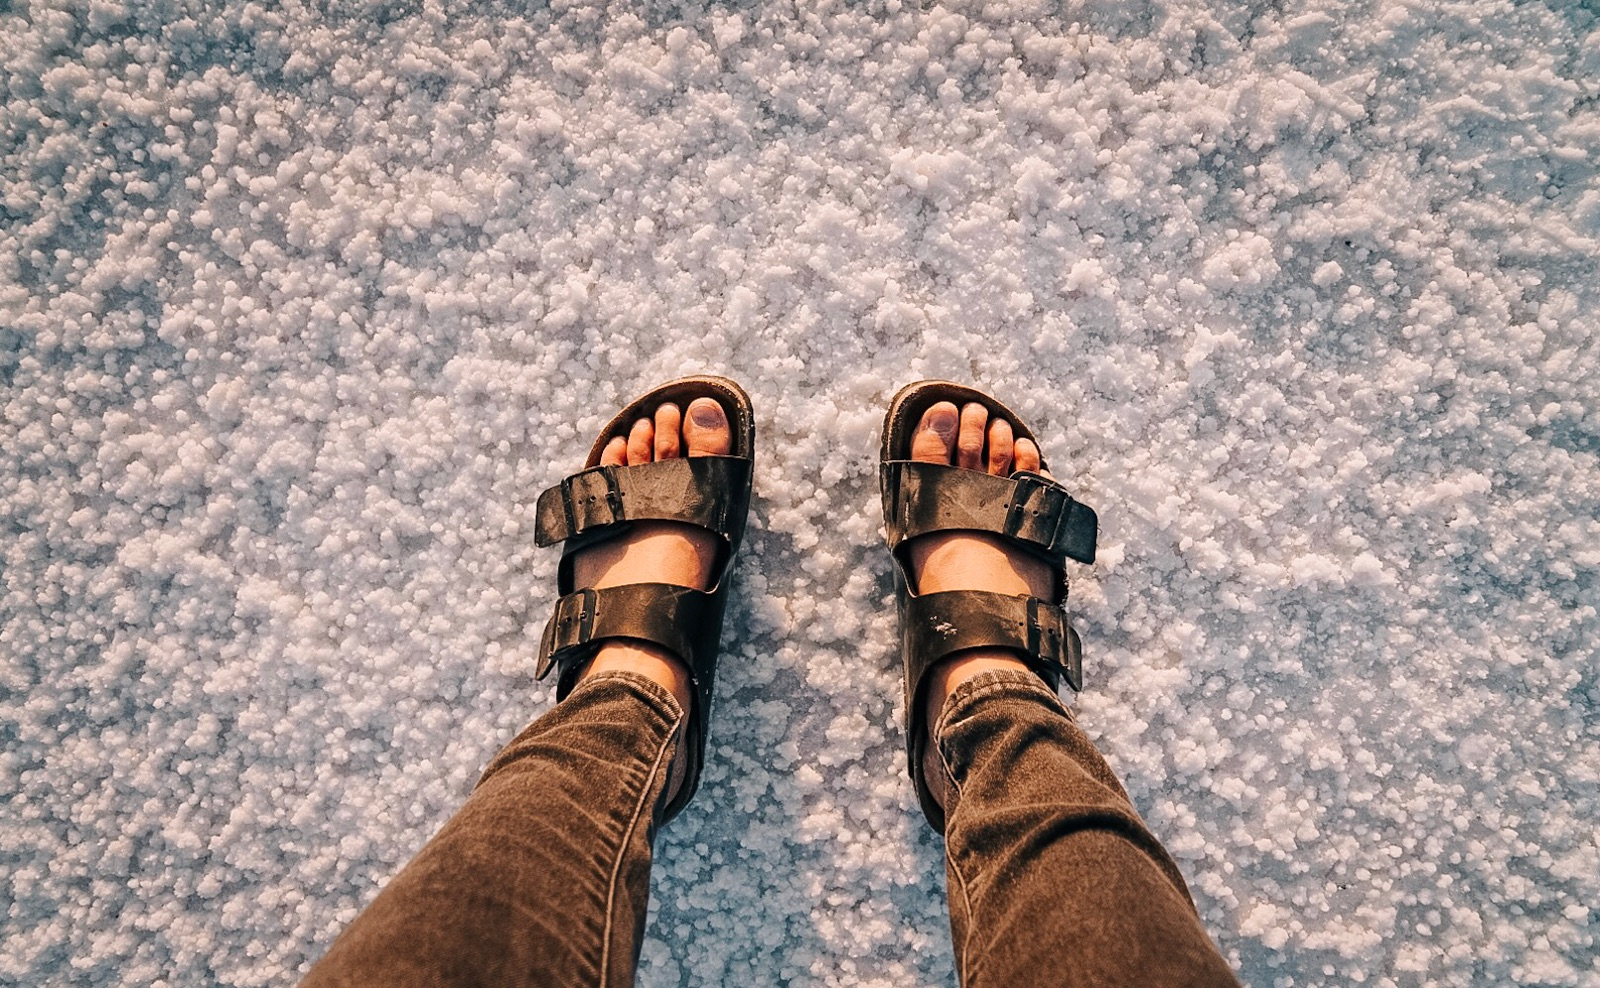 Salty Feet| Sarah Dalton